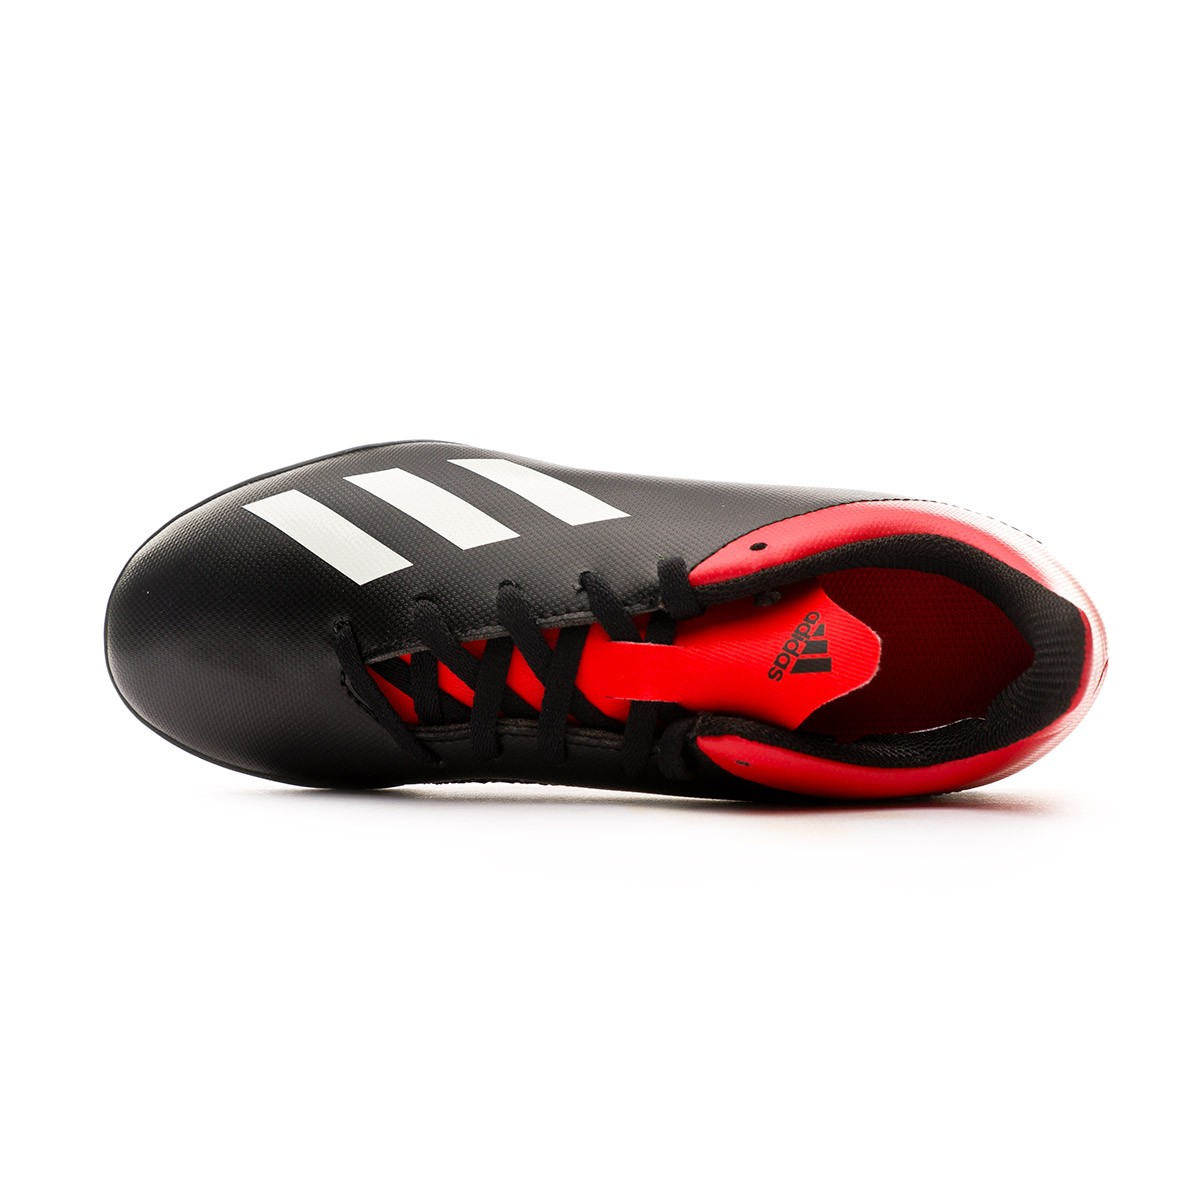 ccbc29ec5 Football Boot adidas Kids X Tango 18.4 Turf Core black-Off white-Active red  - Tienda de fútbol Fútbol Emotion